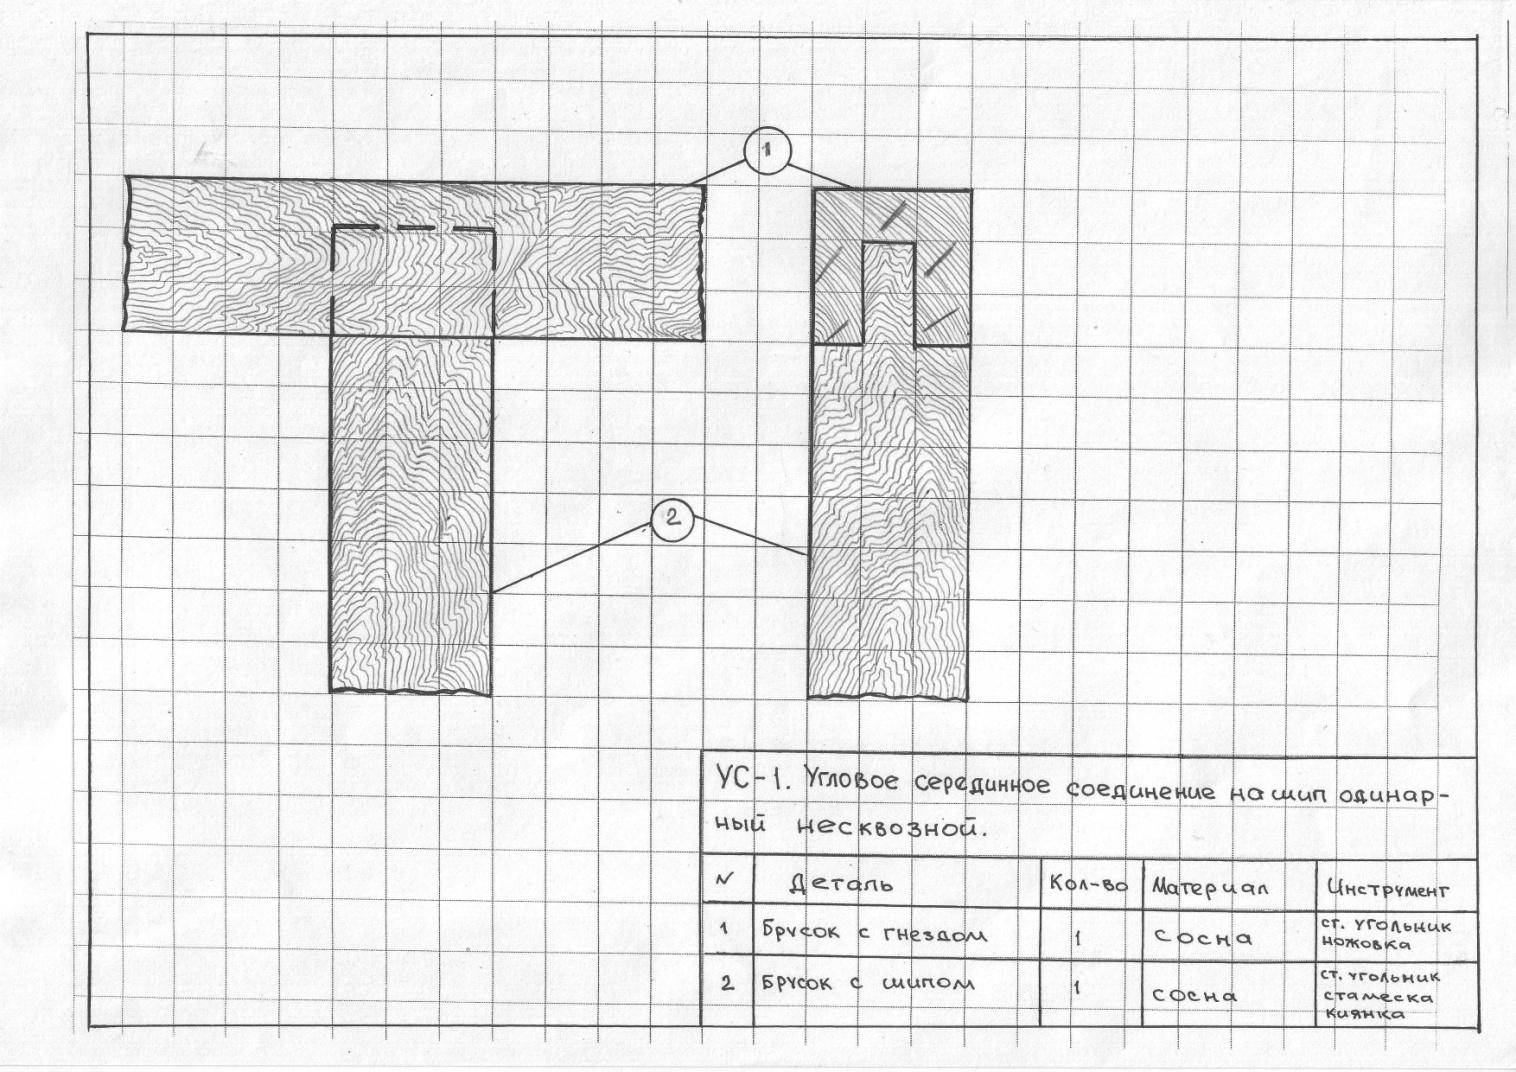 F:\изделия и эскизы\8кл\Image0076.JPG